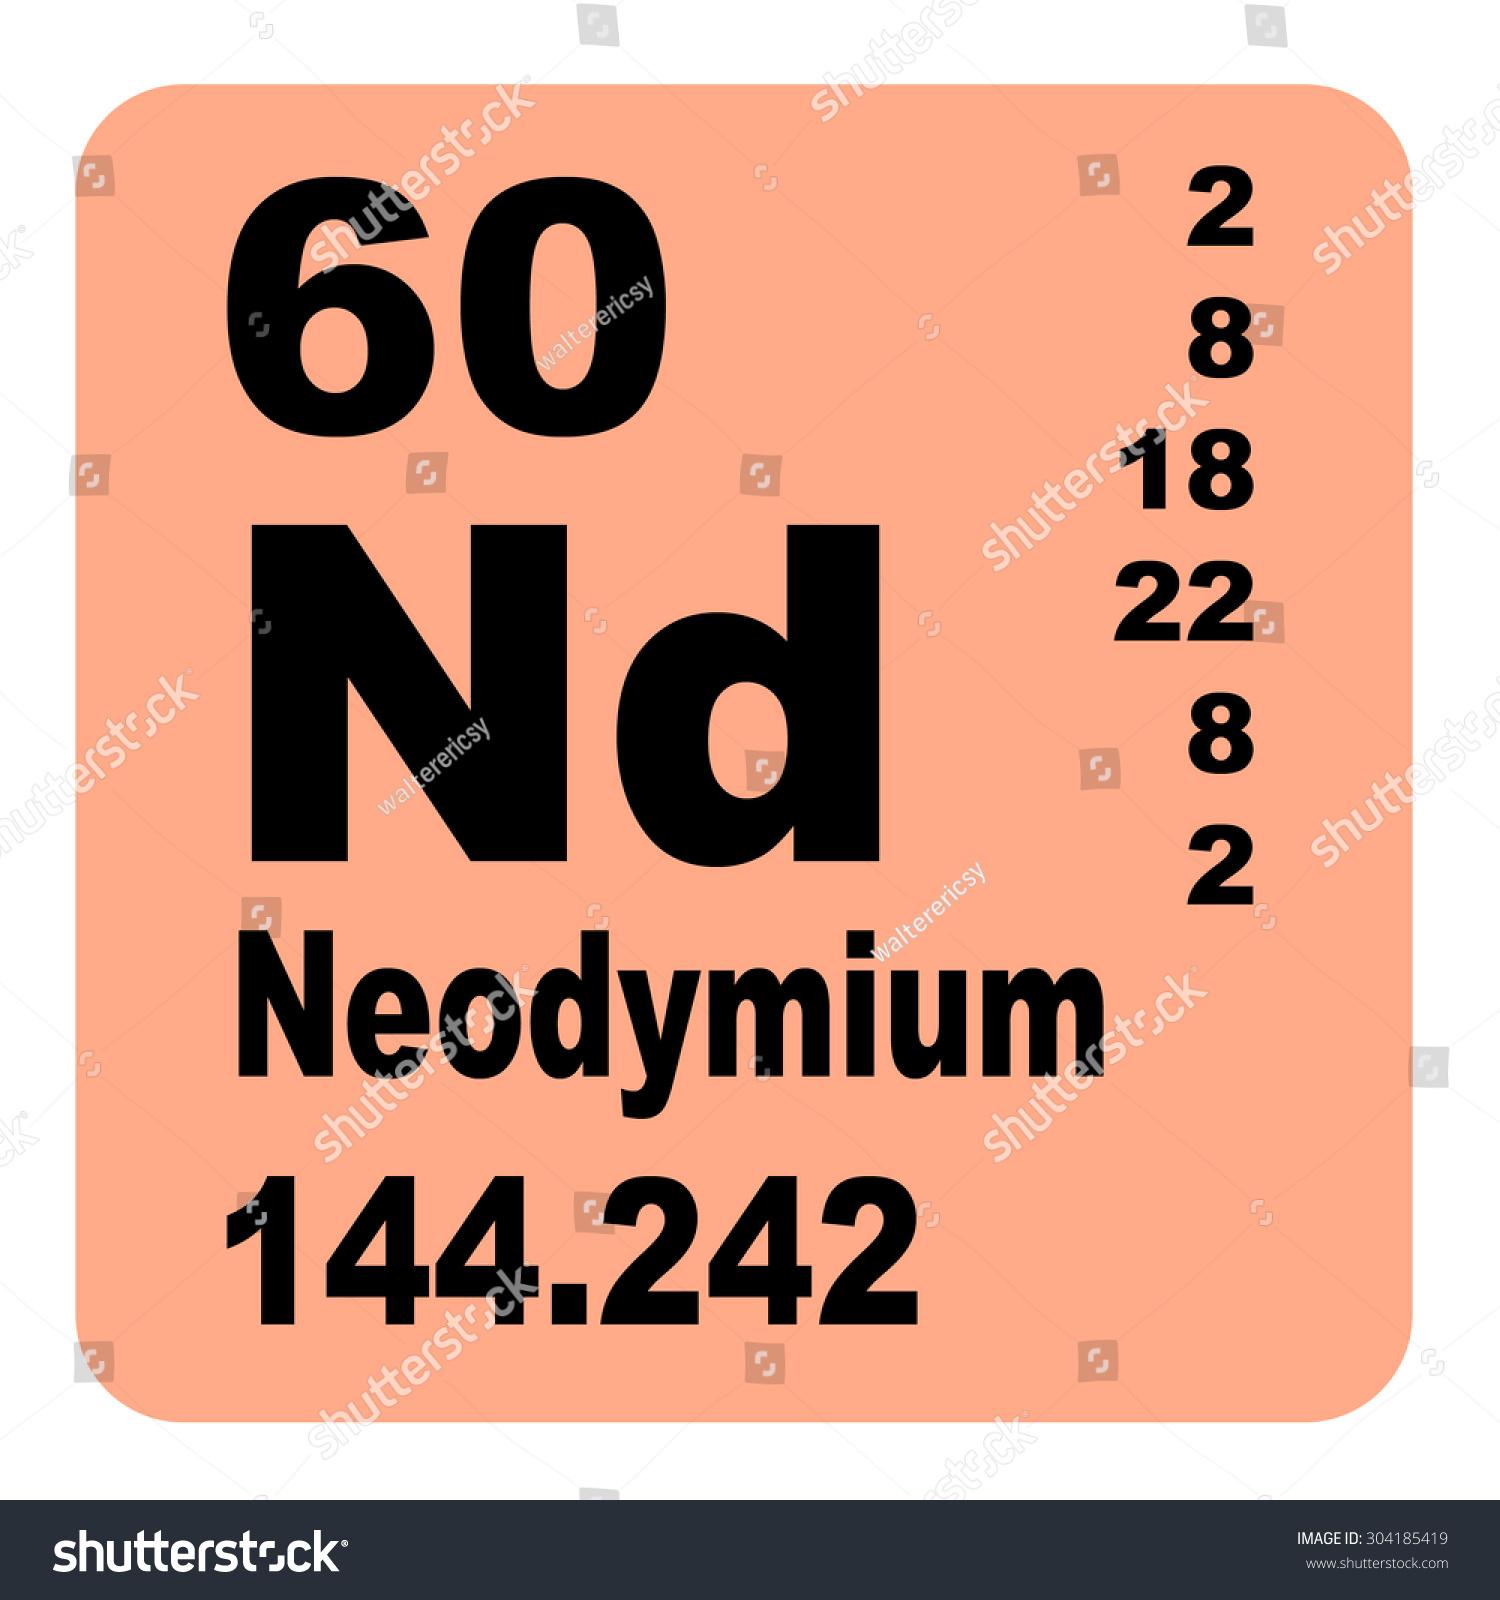 Neodymium periodic table elements stock illustration 304185419 neodymium periodic table of elements gamestrikefo Choice Image